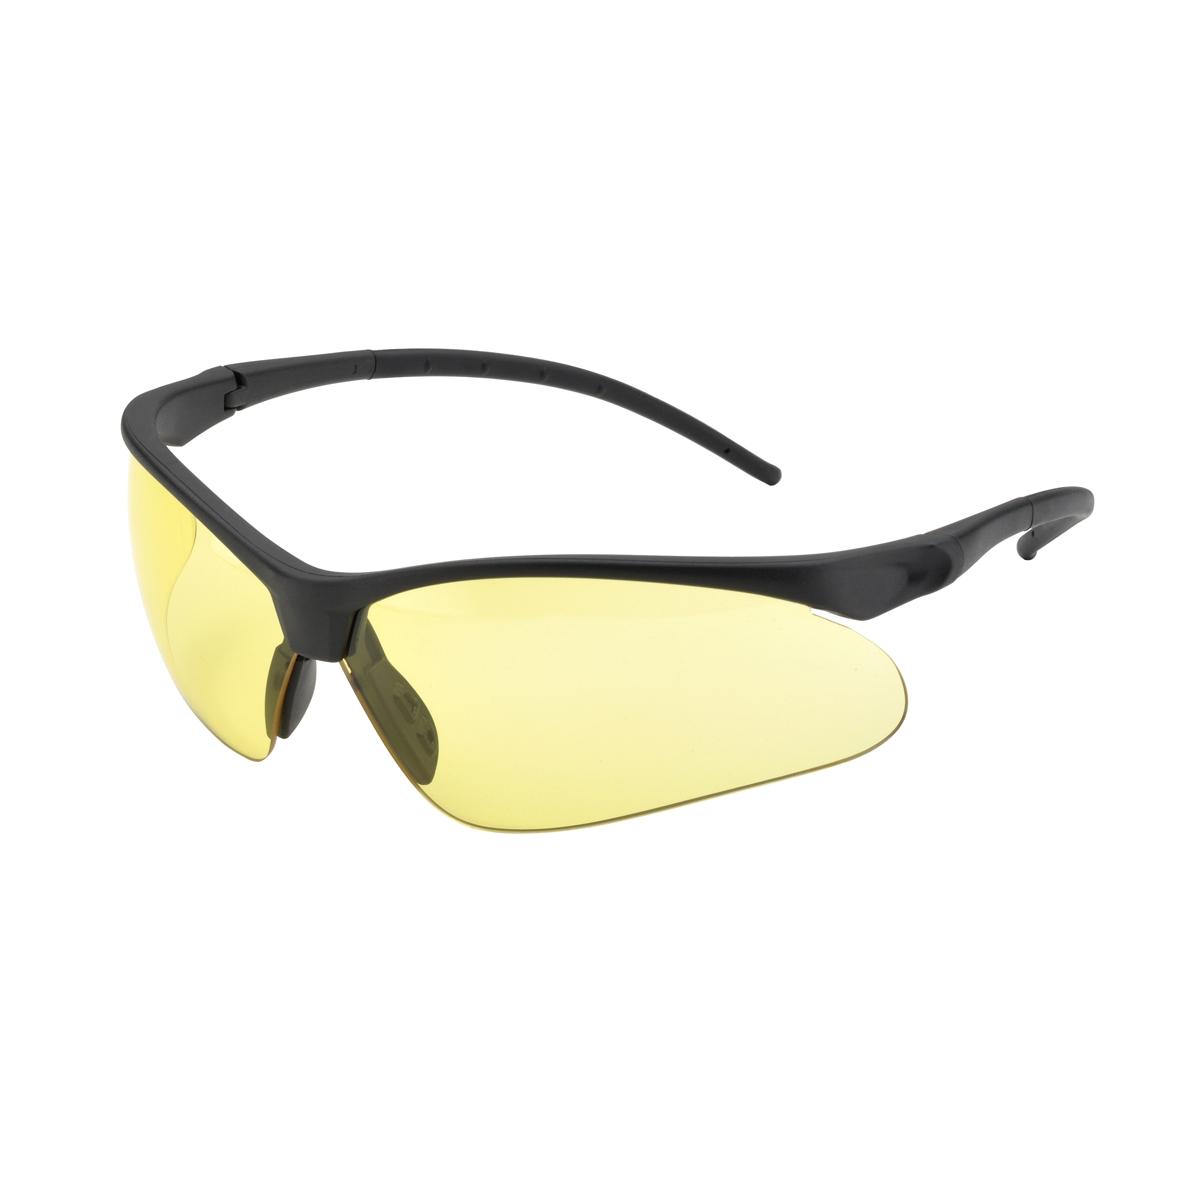 Black Frame Glasses Singapore : Elvex SG-55A Flex-Pro Safety Glasses - Black Frame - Amber ...